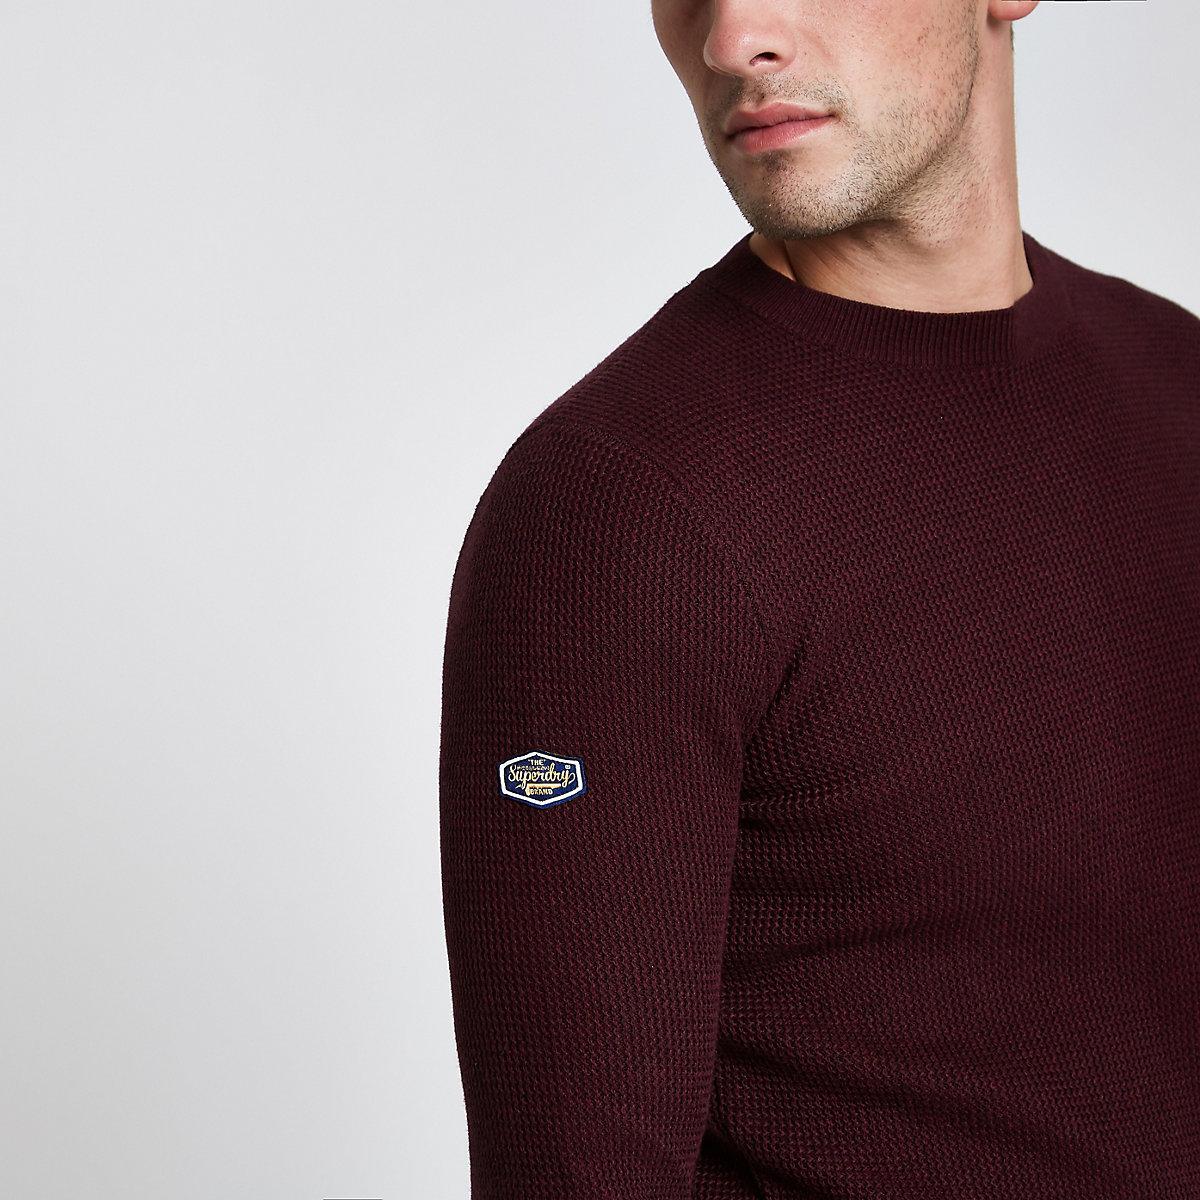 Superdry burgundy textured sweater